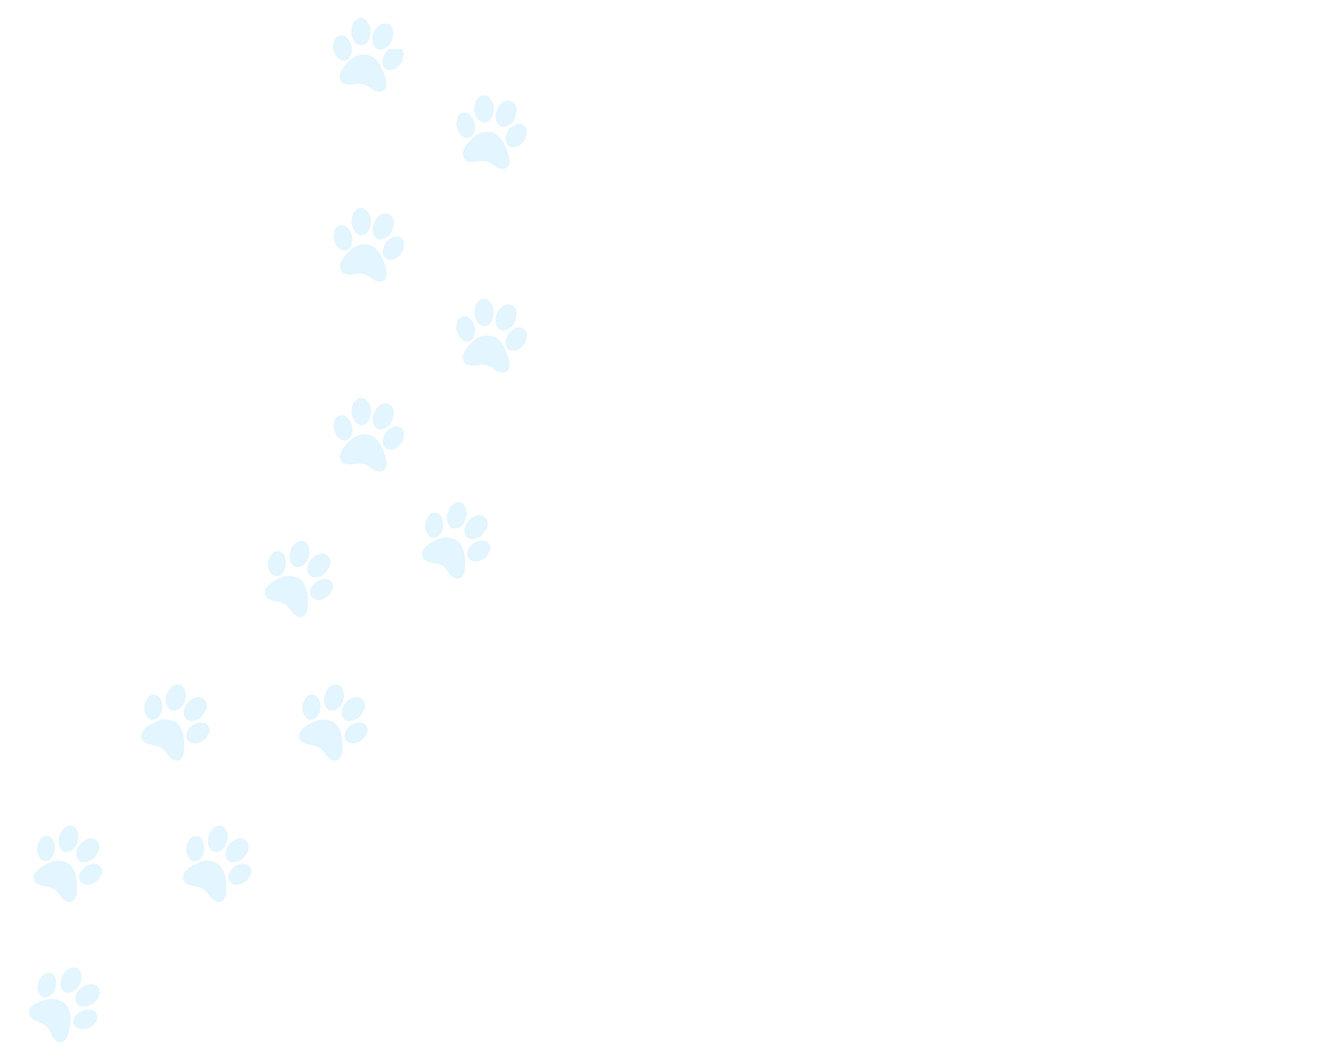 Background Web Paw Prints Blue.jpg